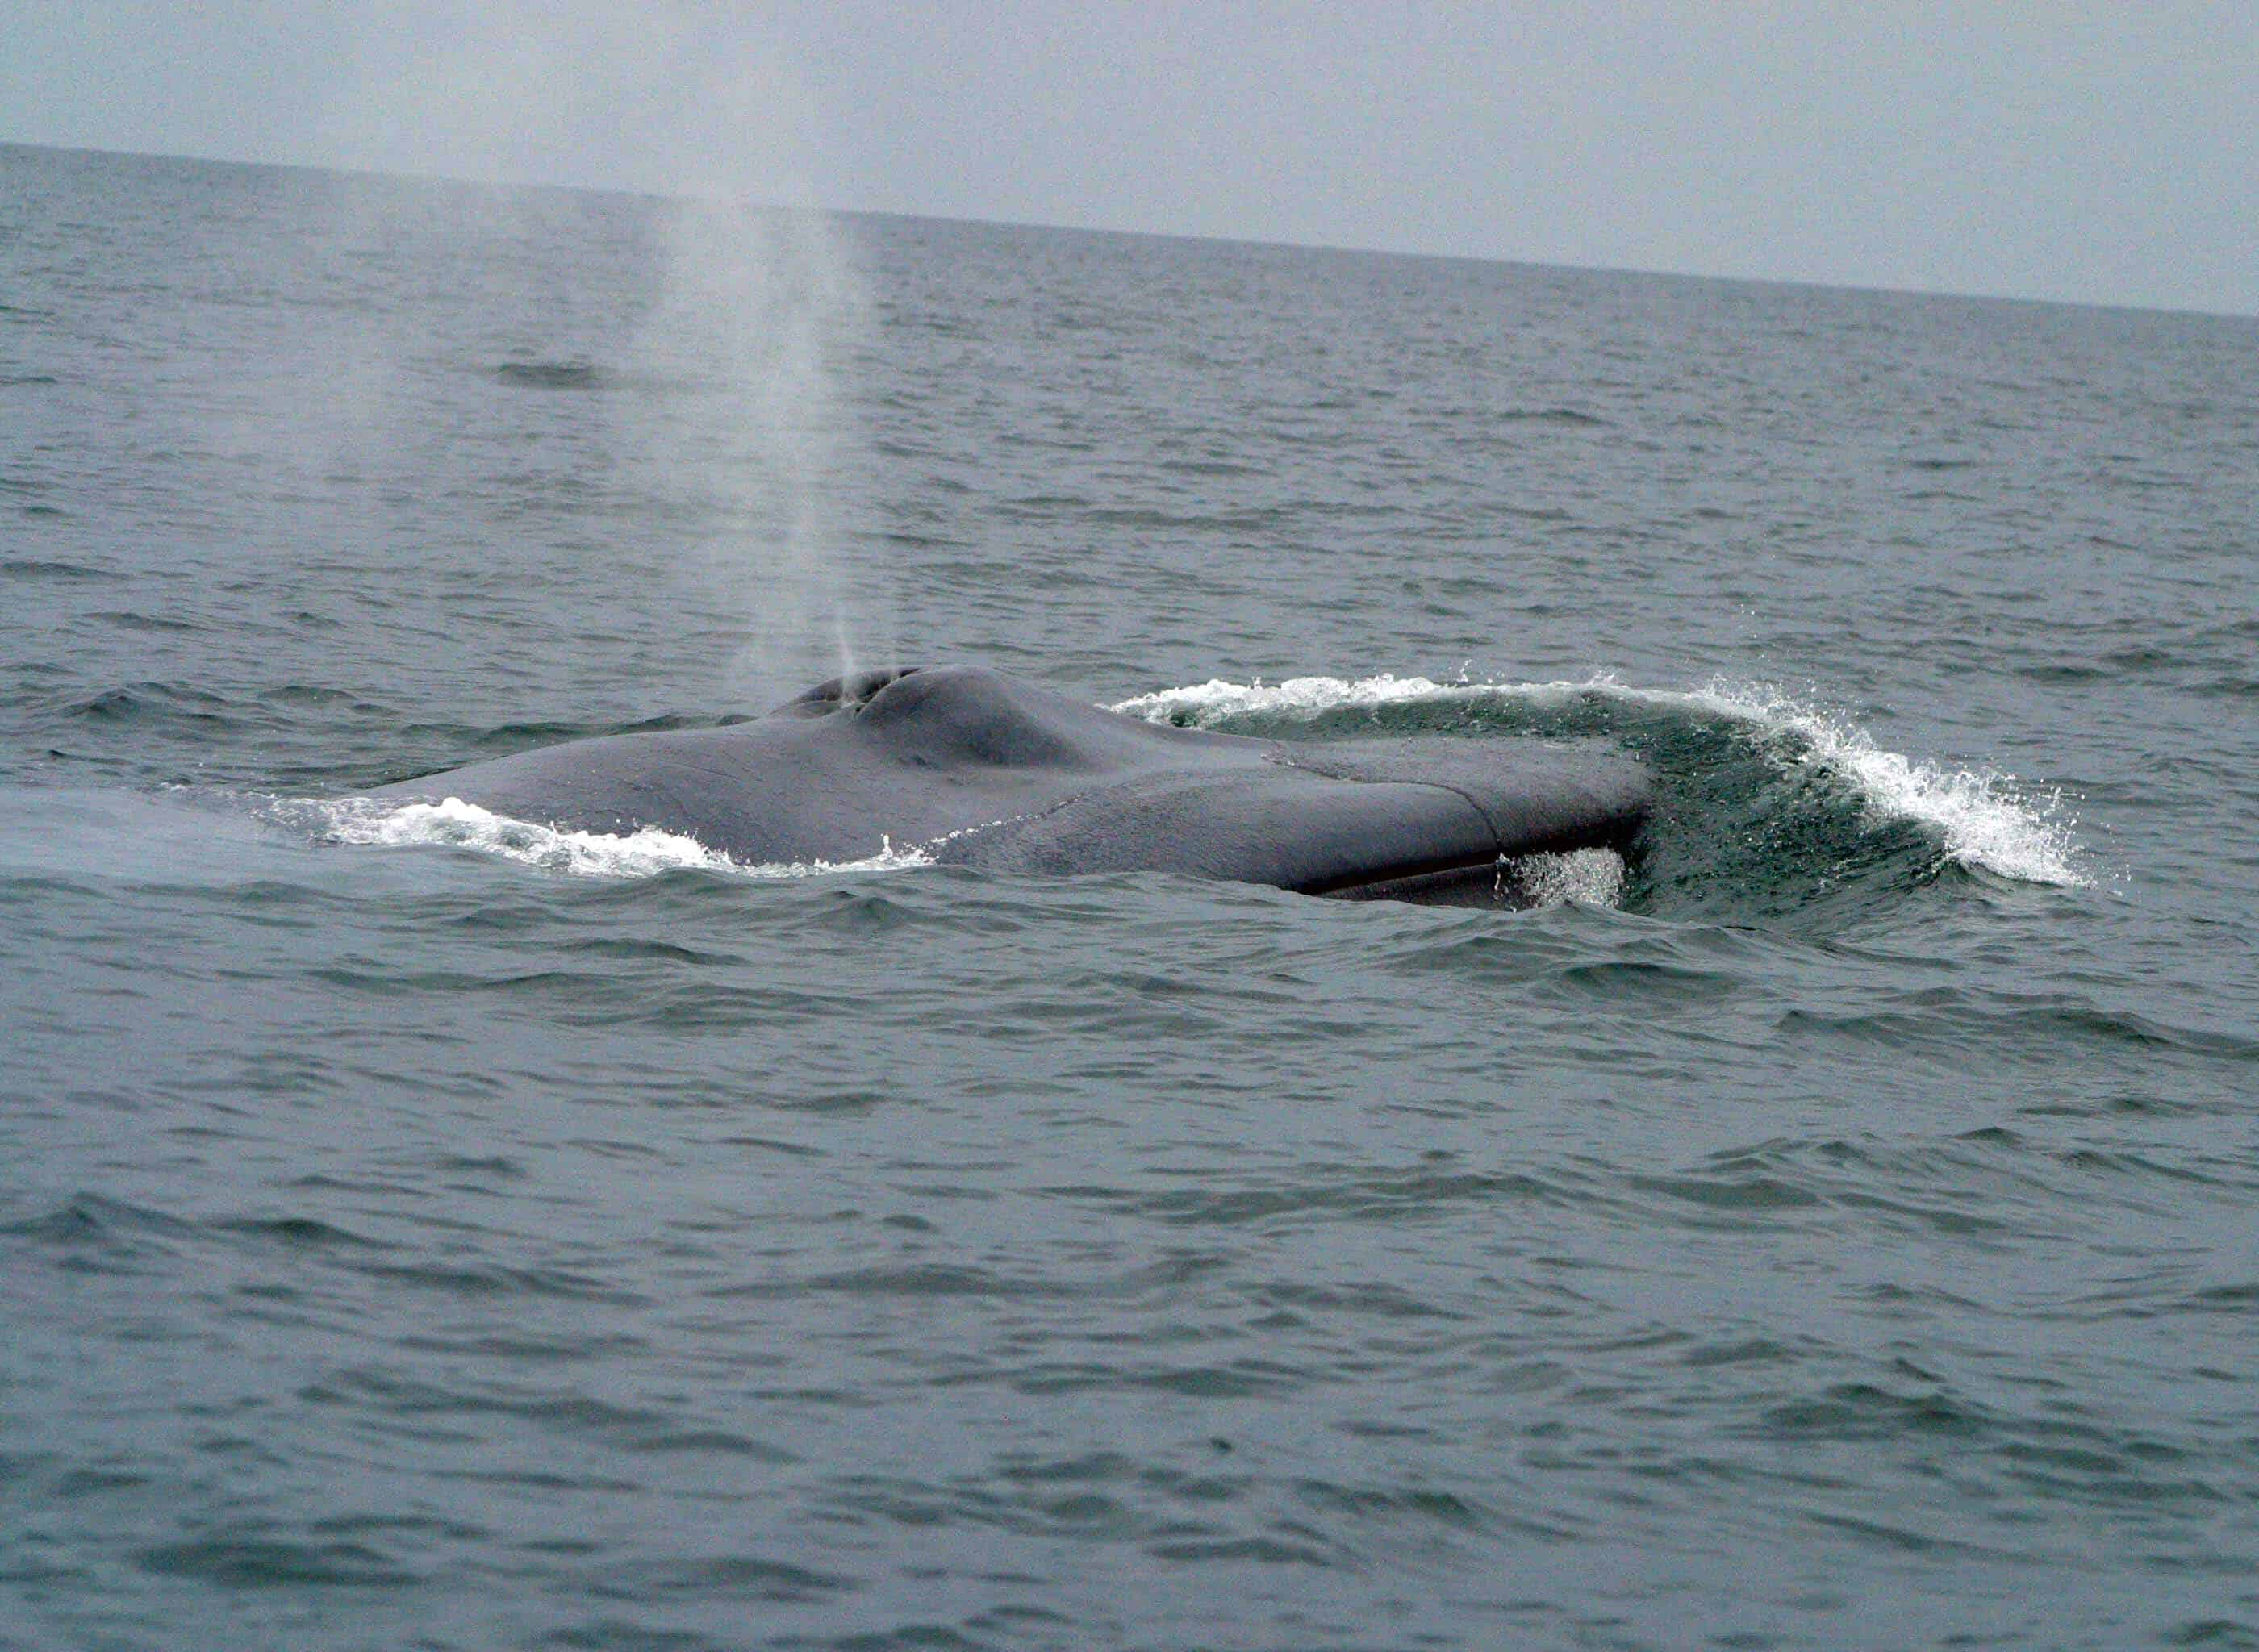 Does a Blue Whale make loud sounds?